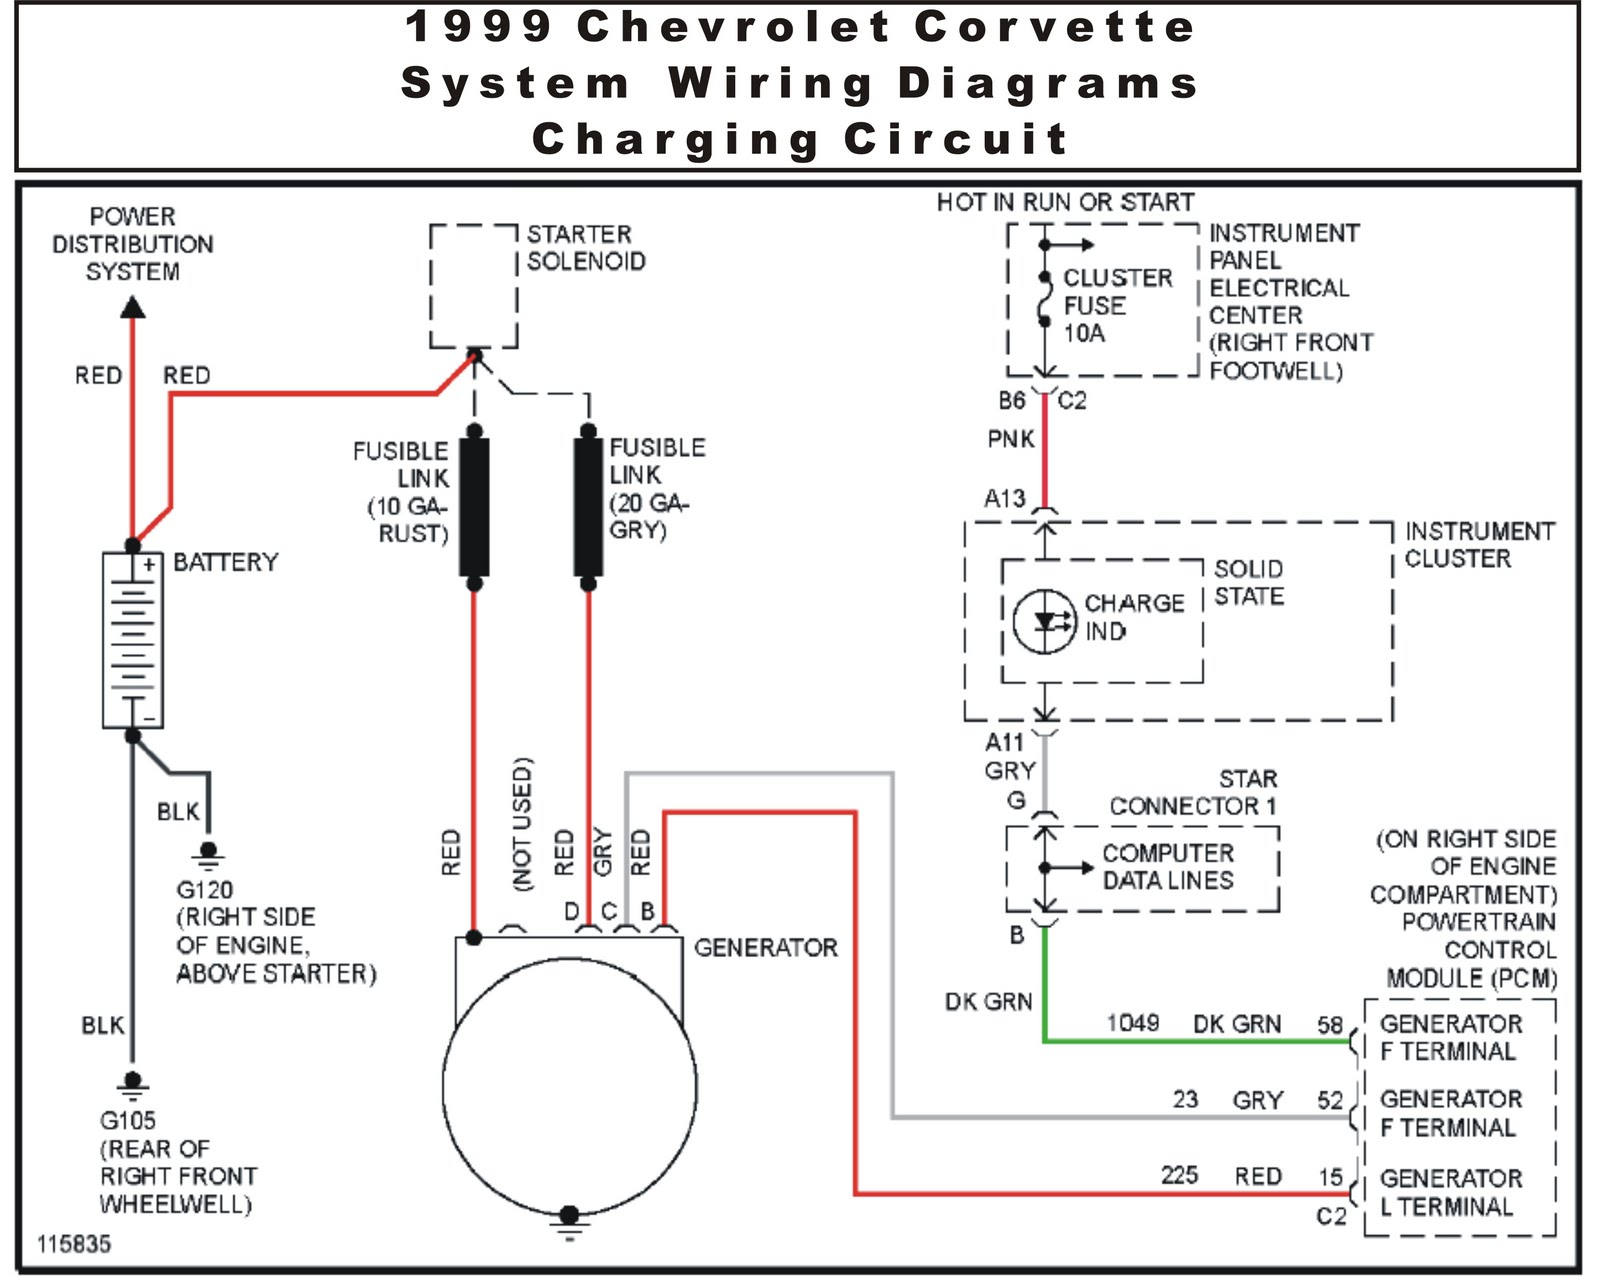 1992 Jeep Wrangler Alternator Wiring 1999 Chevrolet Corvette System Wiring Diagrams Charging